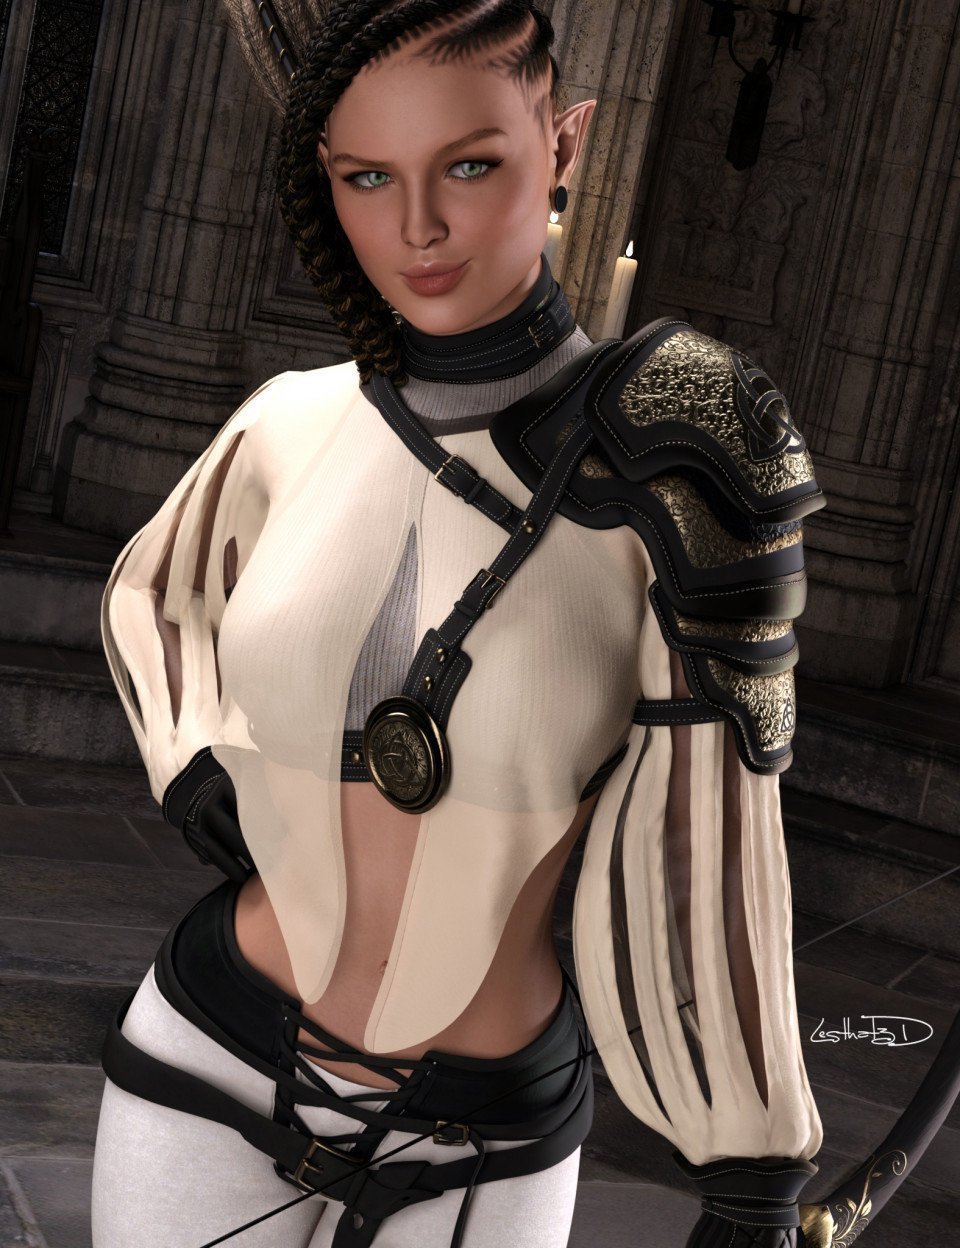 dForce Elven Archer Outfit for Genesis 8 Females_DAZ3D下载站